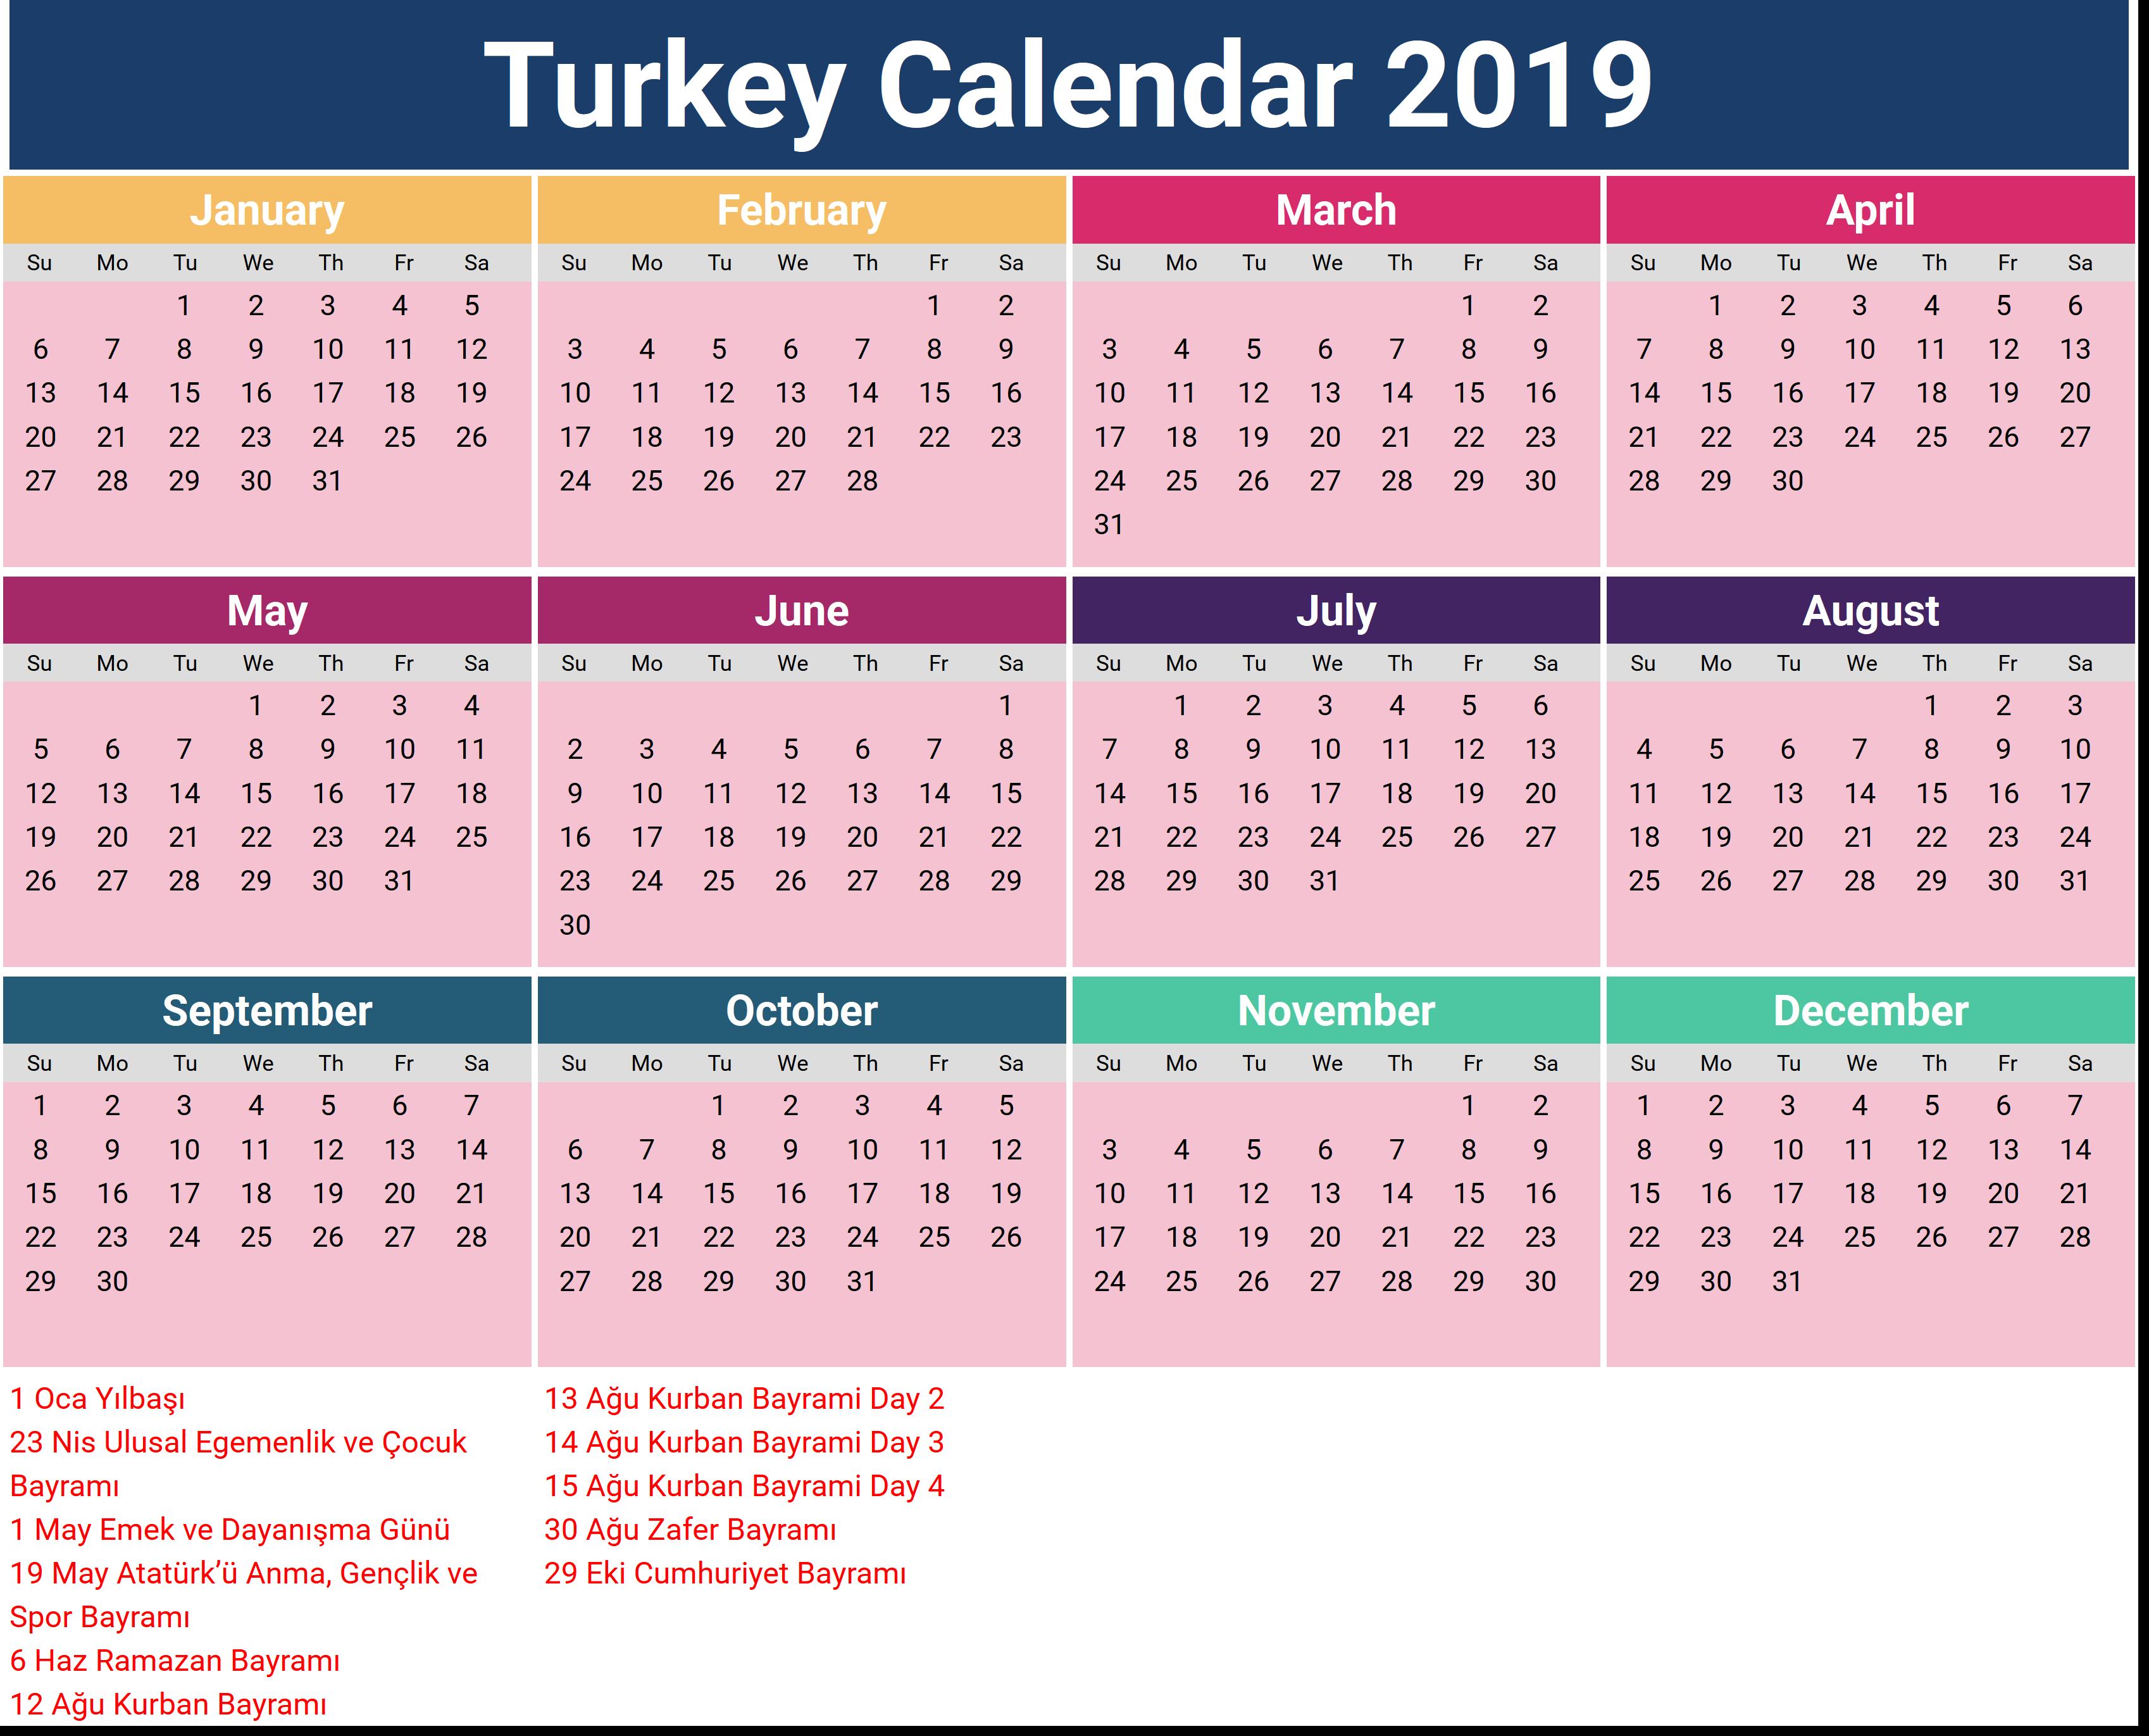 Turkey Holidays Calendar 2019